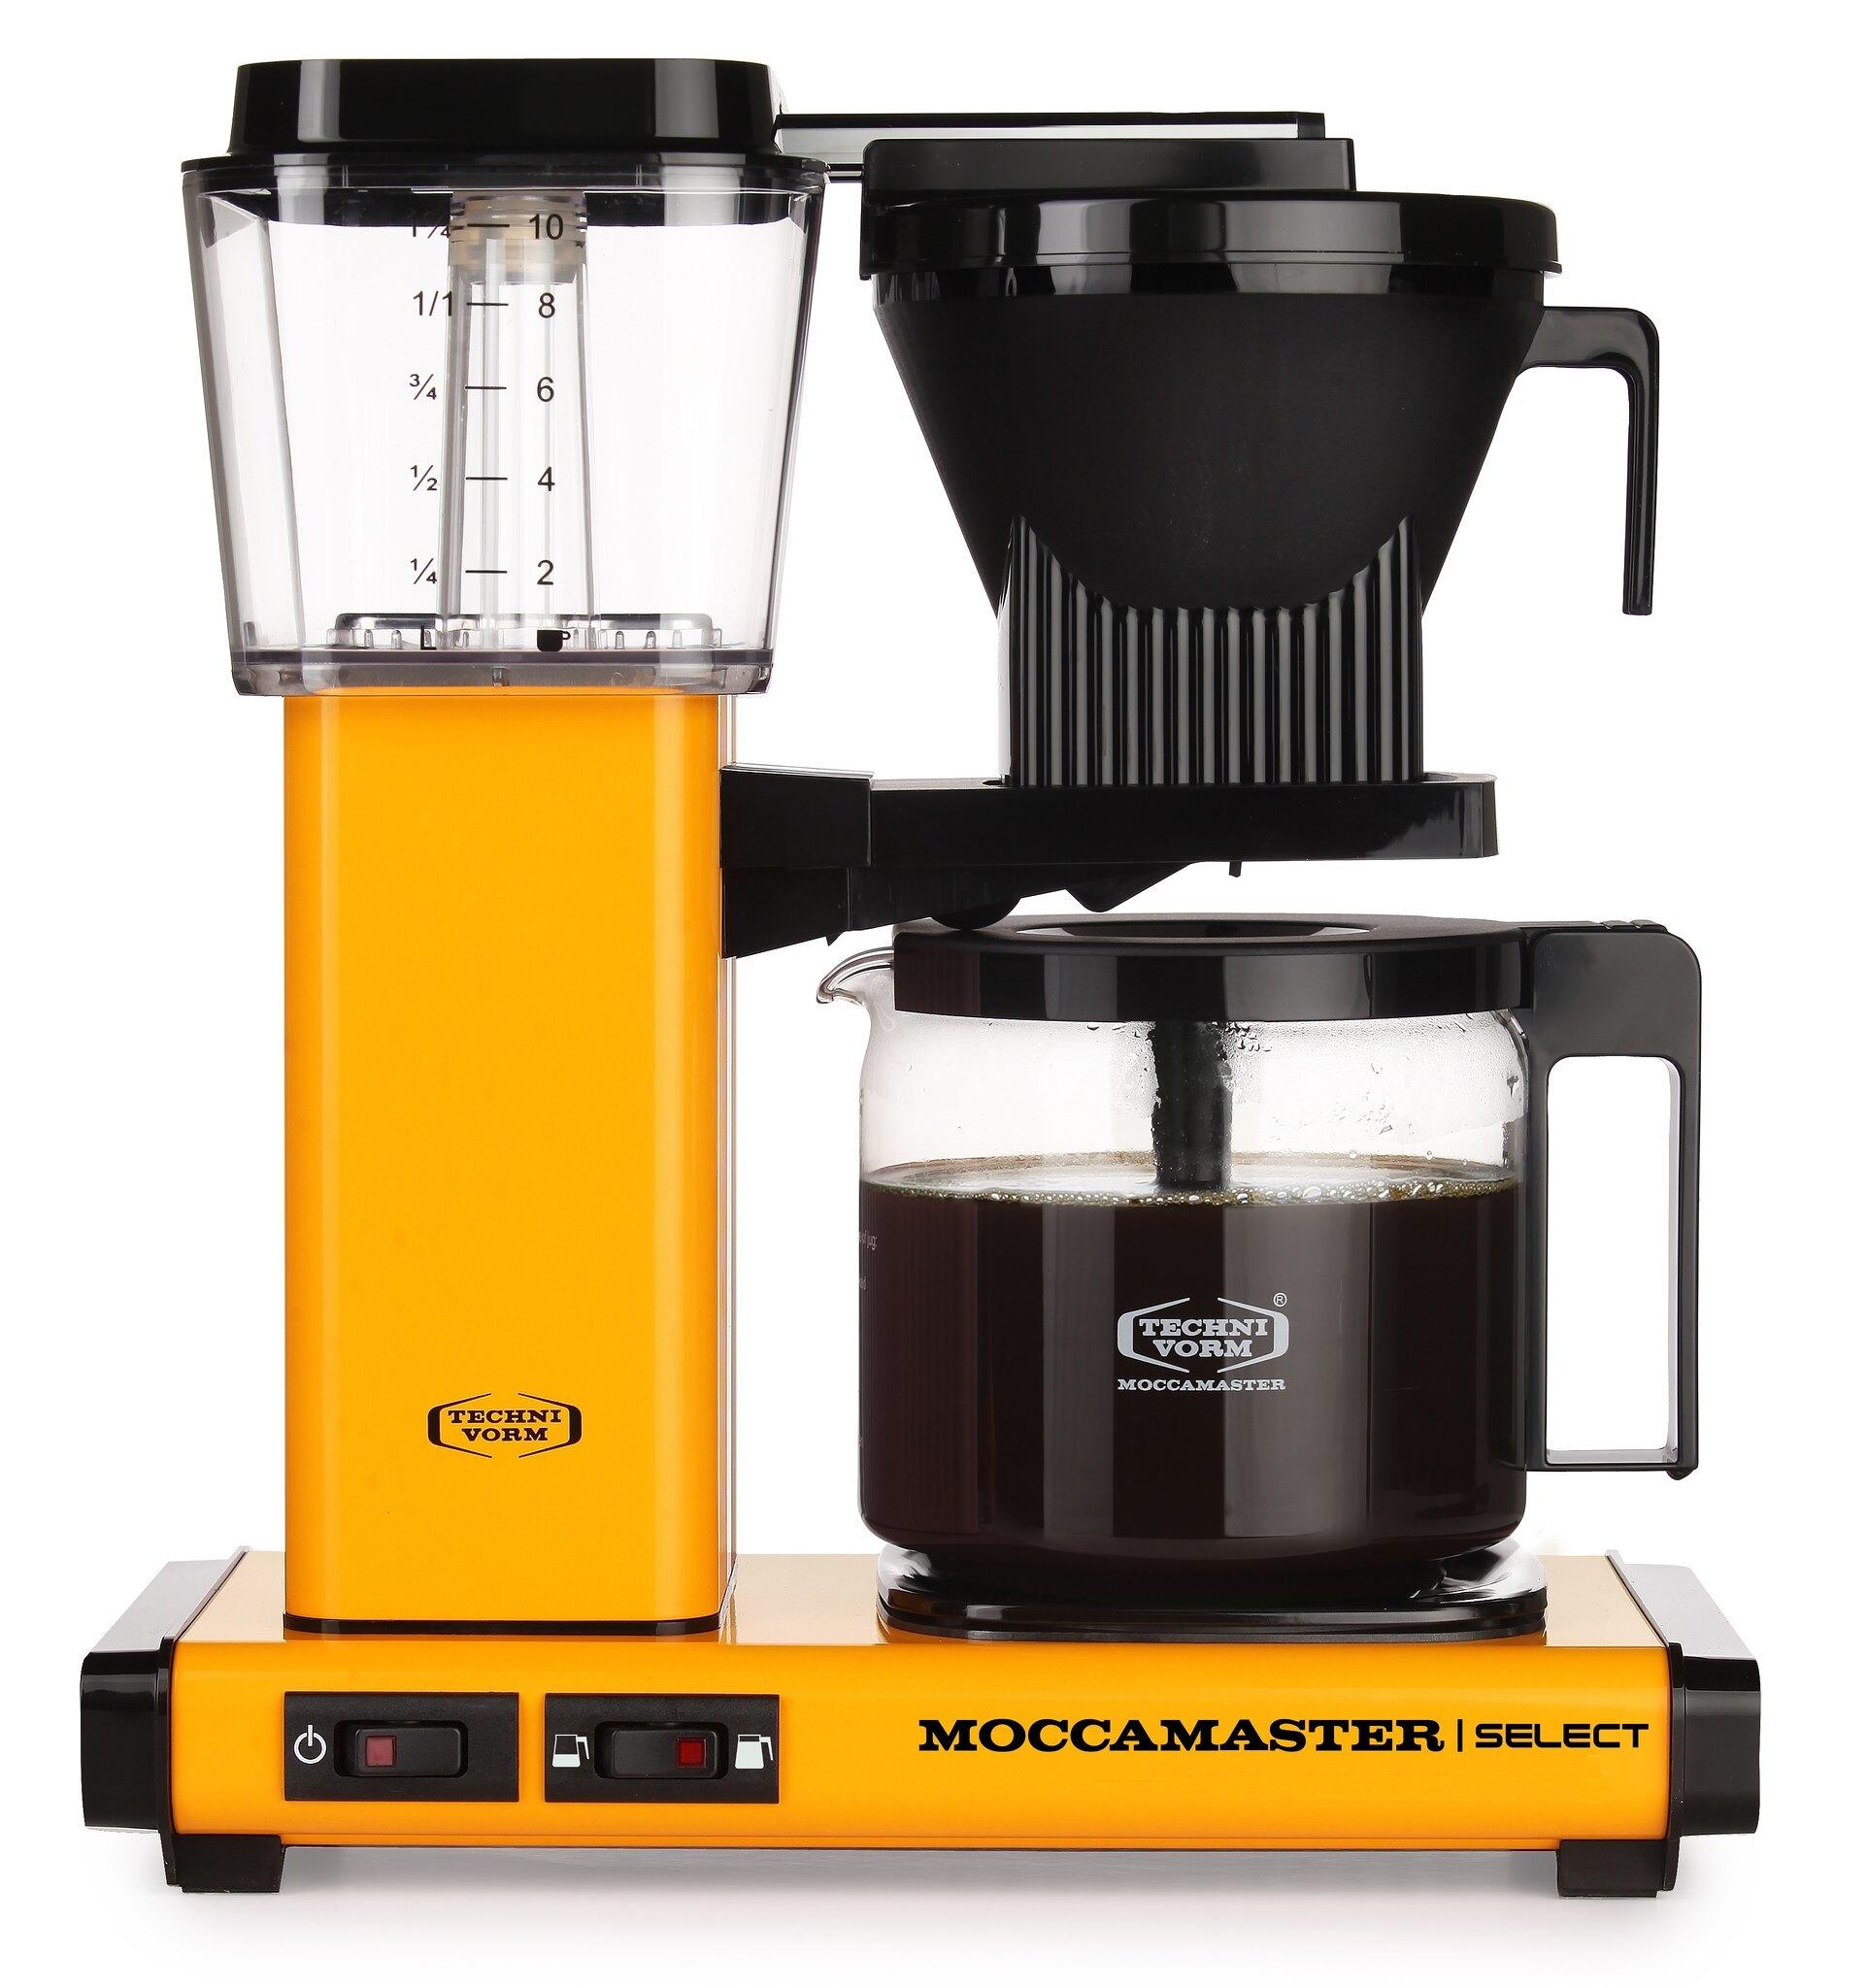 Moccamaster koffiefilter apparaat KBG SELECT geelkoper kopen